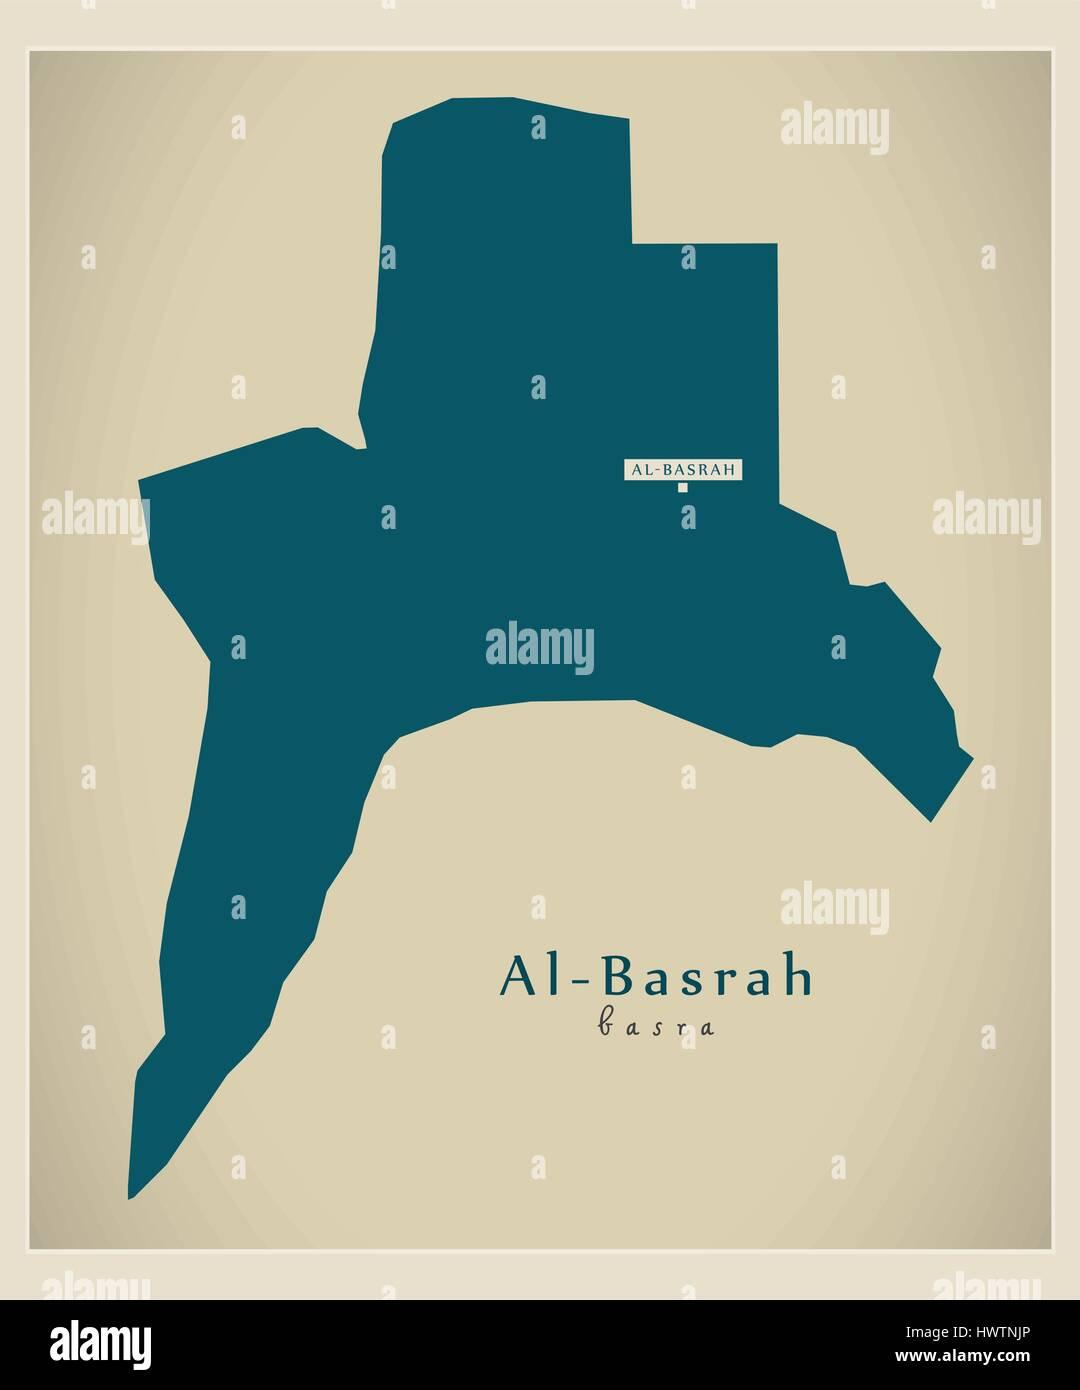 Basrah Iraq Stock Photos & Basrah Iraq Stock Images - Alamy on map of istanbul, map of mogadishu, map of hankou, map of ramallah, map of karachi, map of kabul, map of irbil, map of sulaymaniyah, map of shuwaikh port, map of jeddah, map of ormuz, map of kurdish people, map of bukhara, map of fustat, map of riyadh, map of zagros mountains, map of tel aviv, map of delhi, map of samarkand, map of beirut,